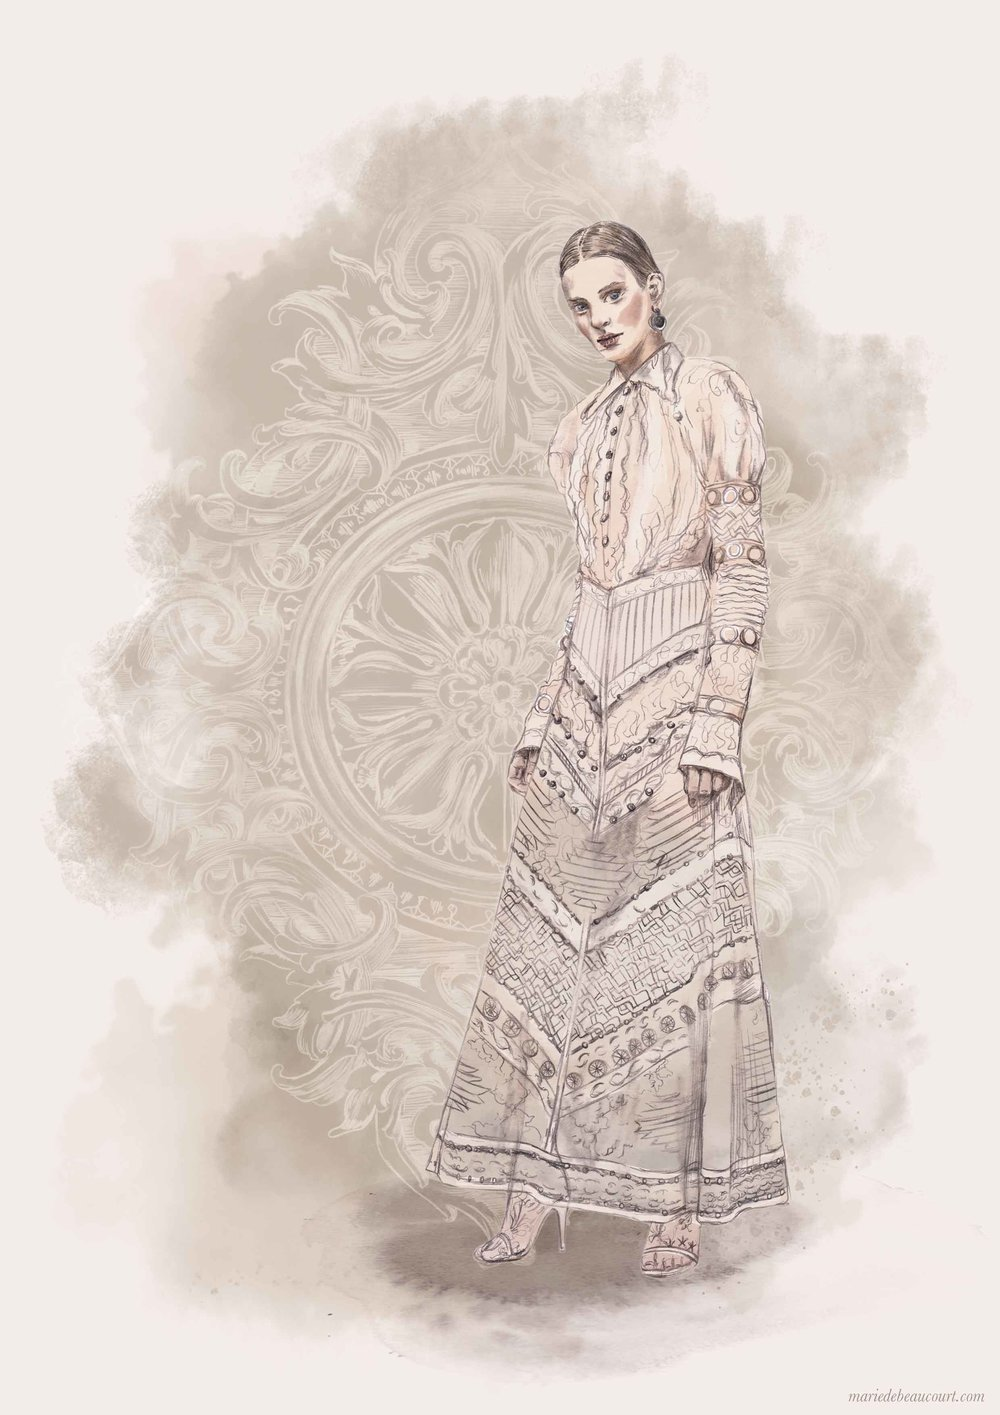 marie-de-beaucourt-fashion-illustration-givenchy-2017-web.jpg